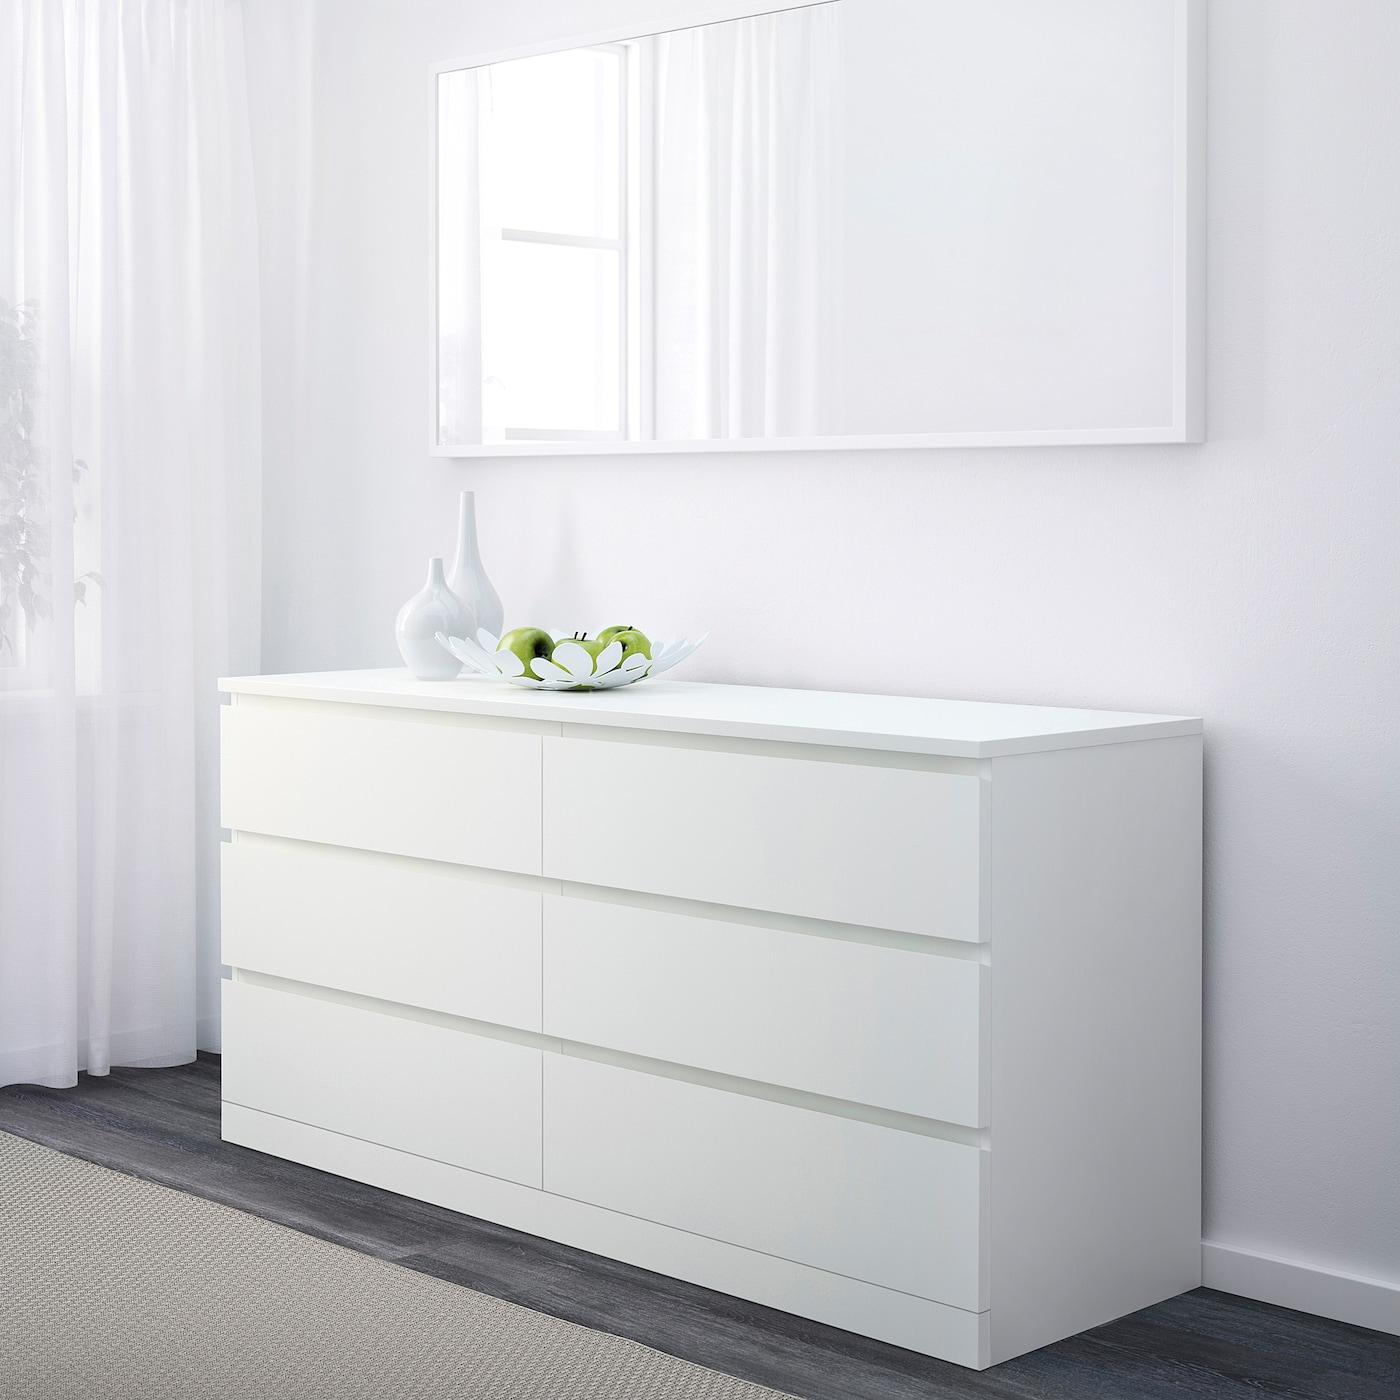 shiny white dresser